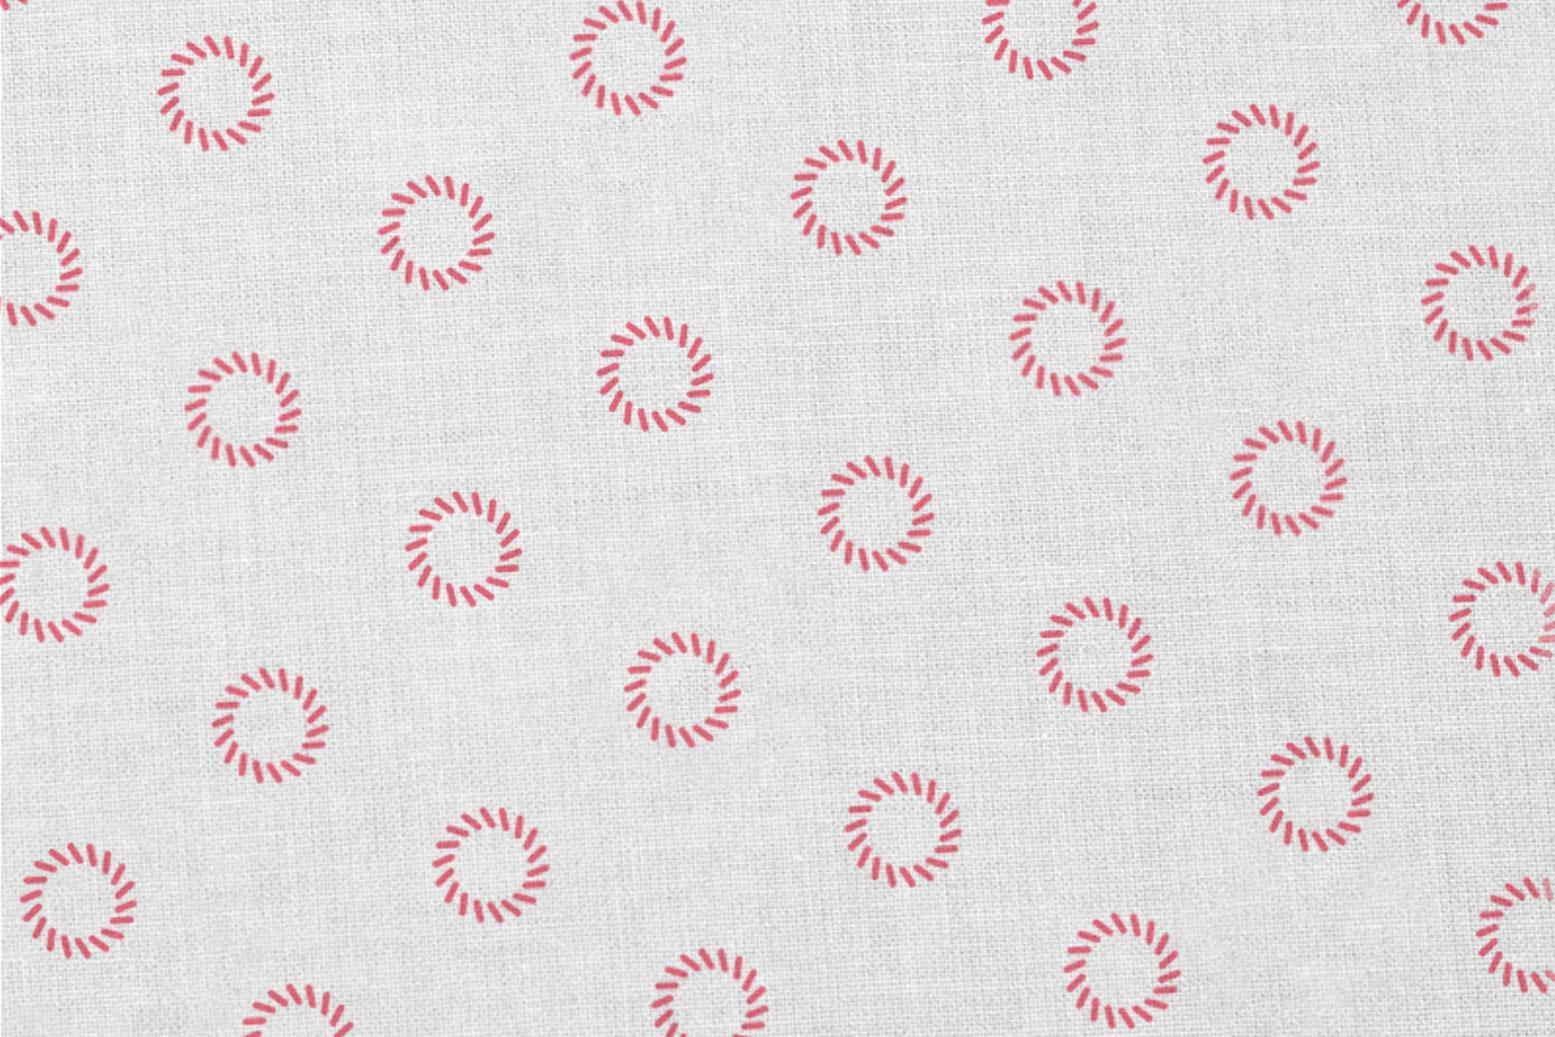 Pattern-4-1